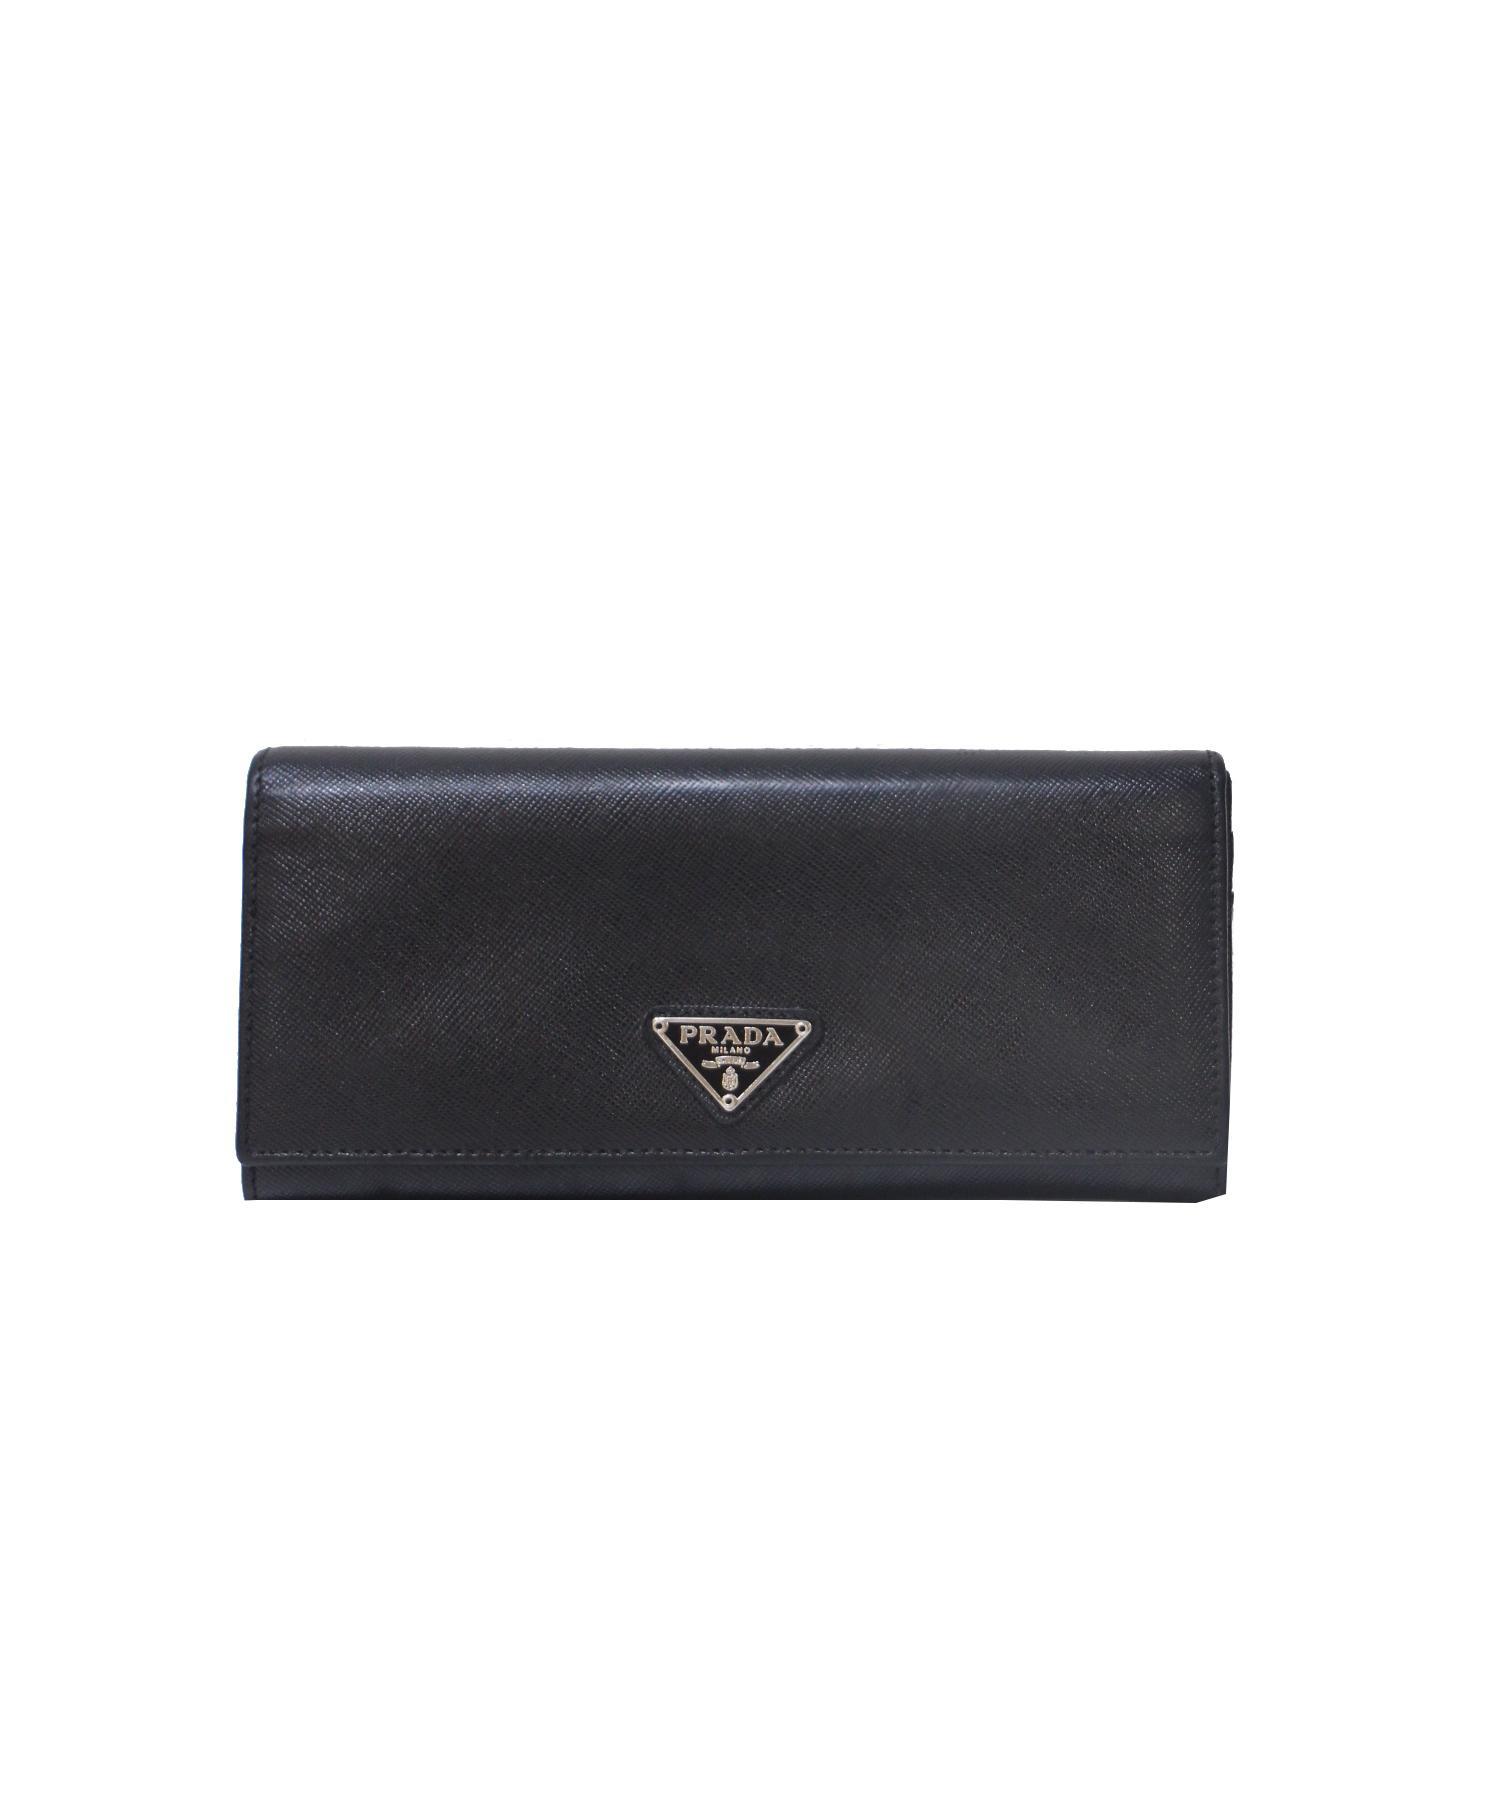 new style 0579f 167c7 [中古]PRADA(プラダ)のレディース 服飾小物 レザーロングウォレット/長財布